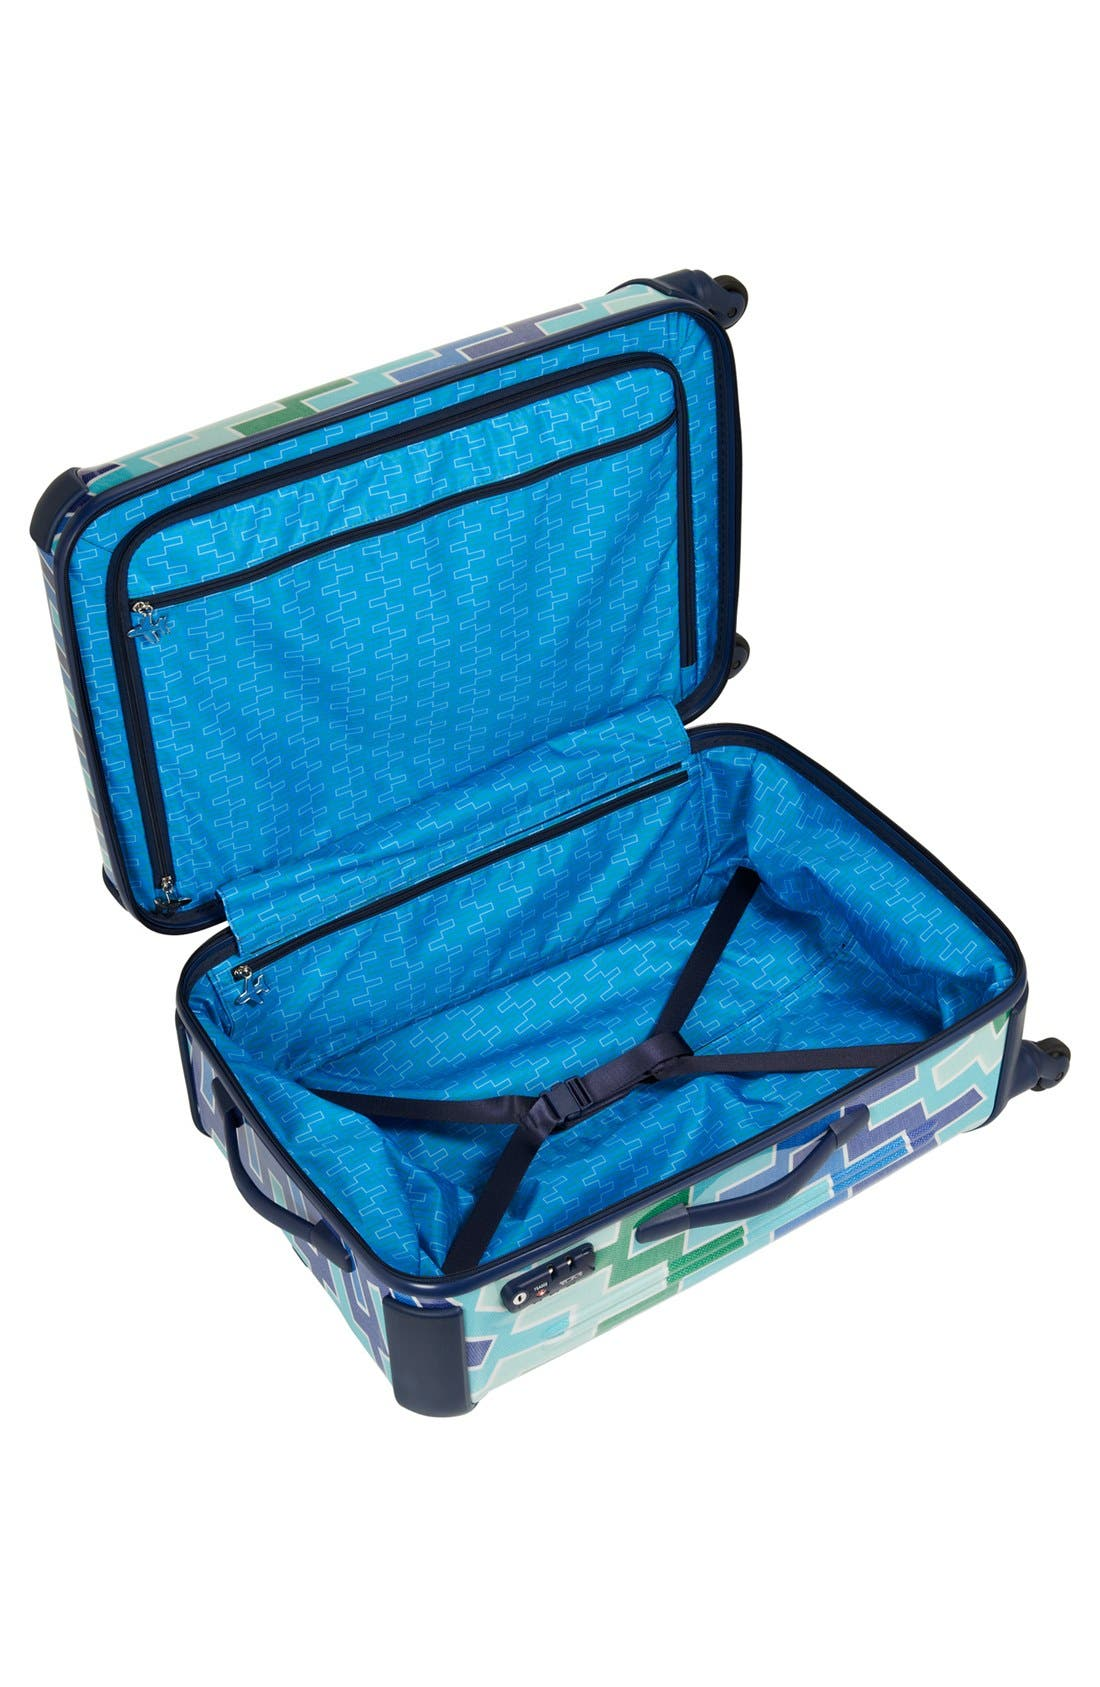 Alternate Image 3  - Tumi 'Vapor™ - Jonathan Adler' Medium Trip Packing Case